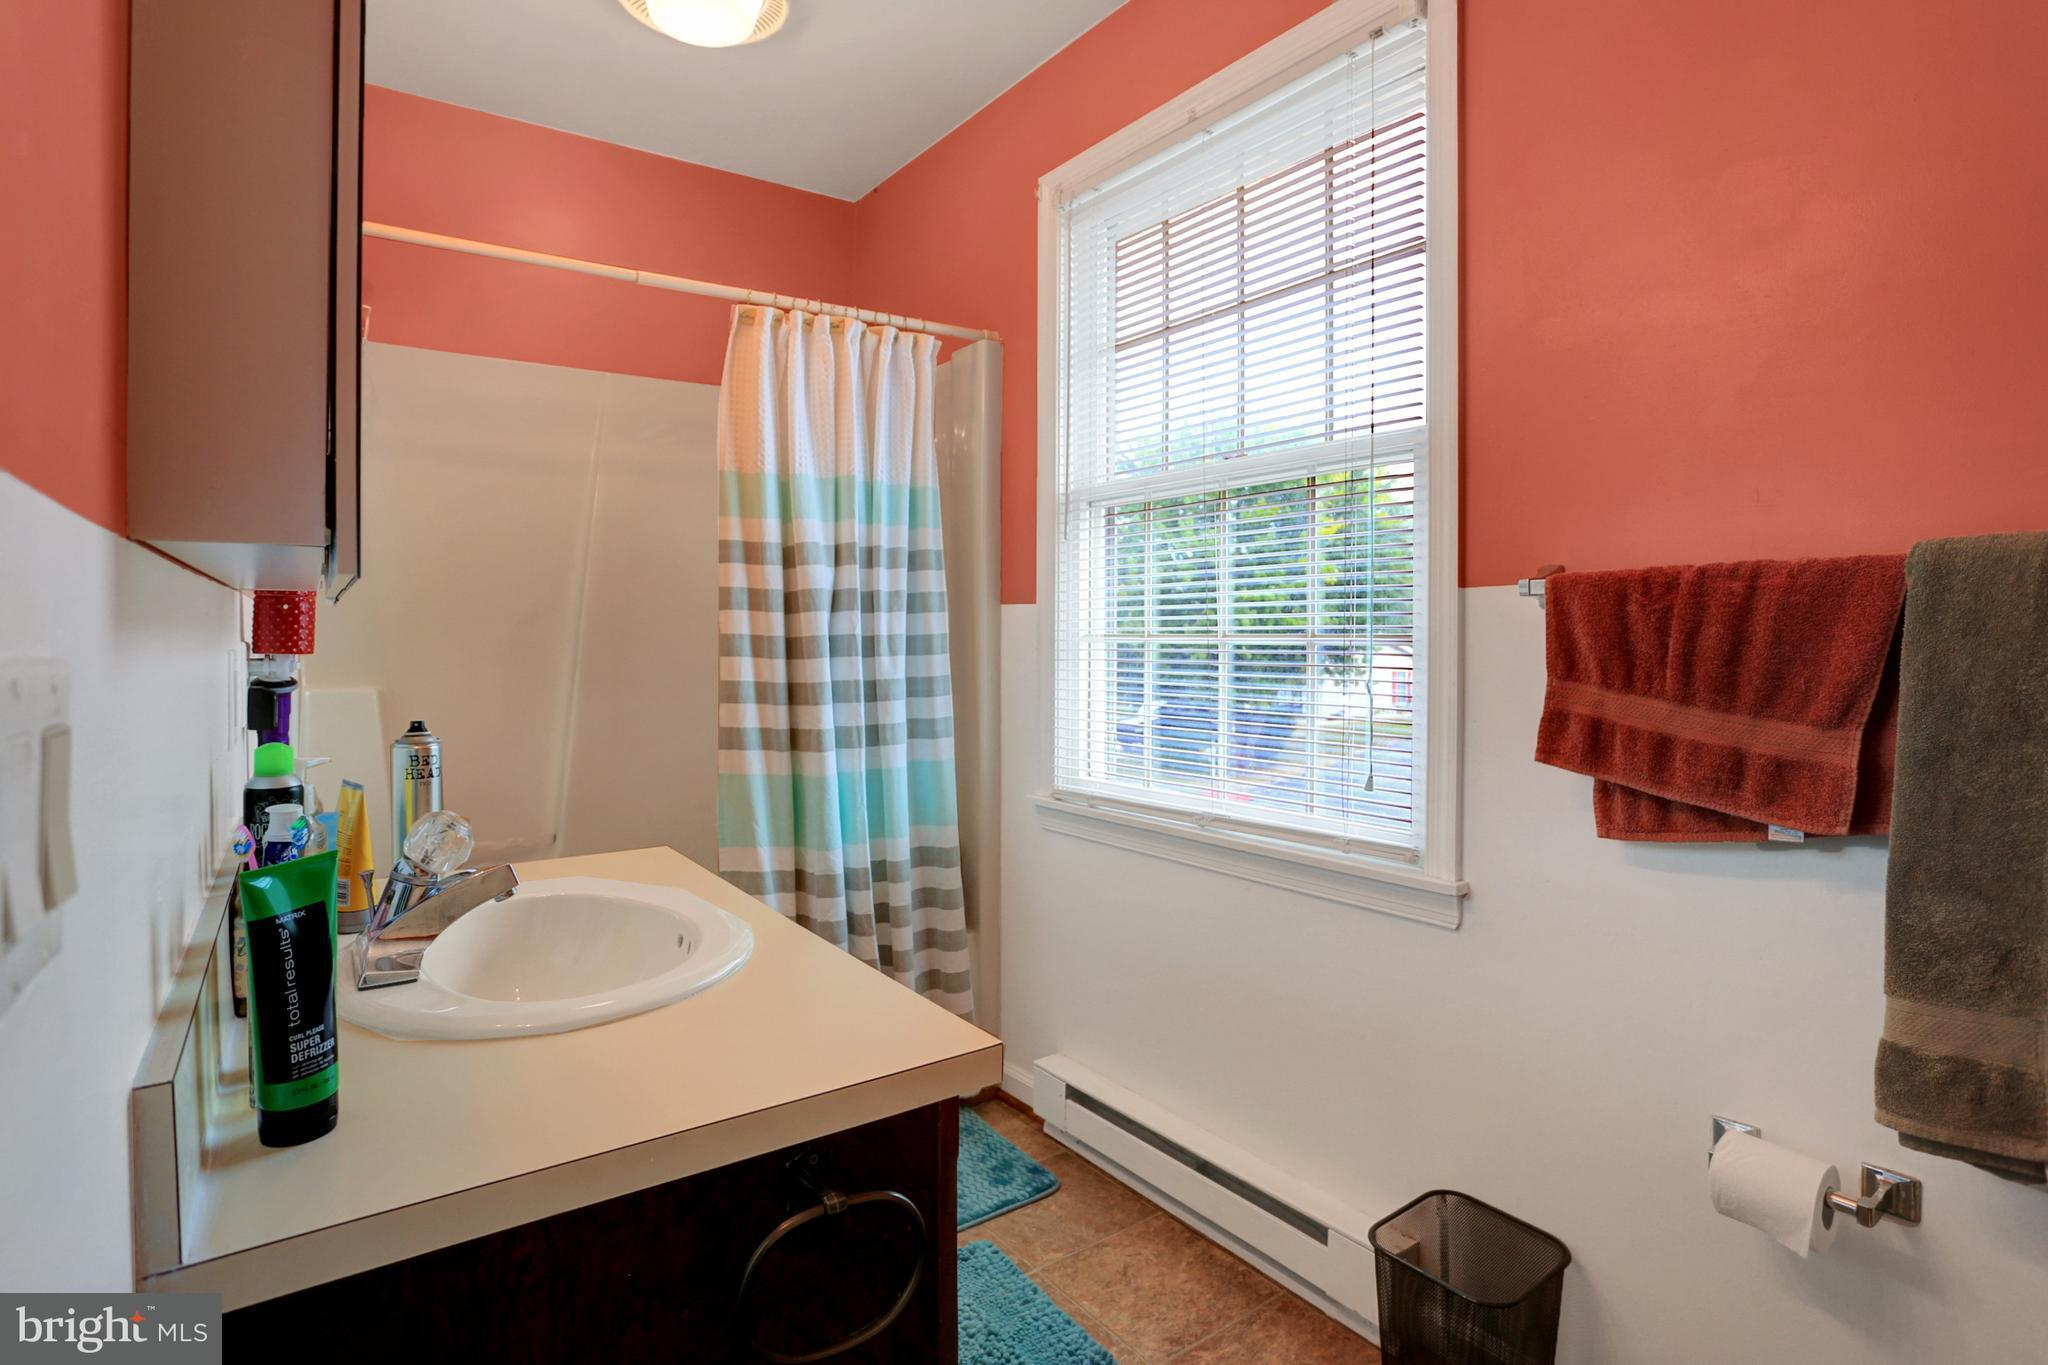 FILLMORE DRIVE Chambersburg PA MLS RE - Bathroom remodeling chambersburg pa